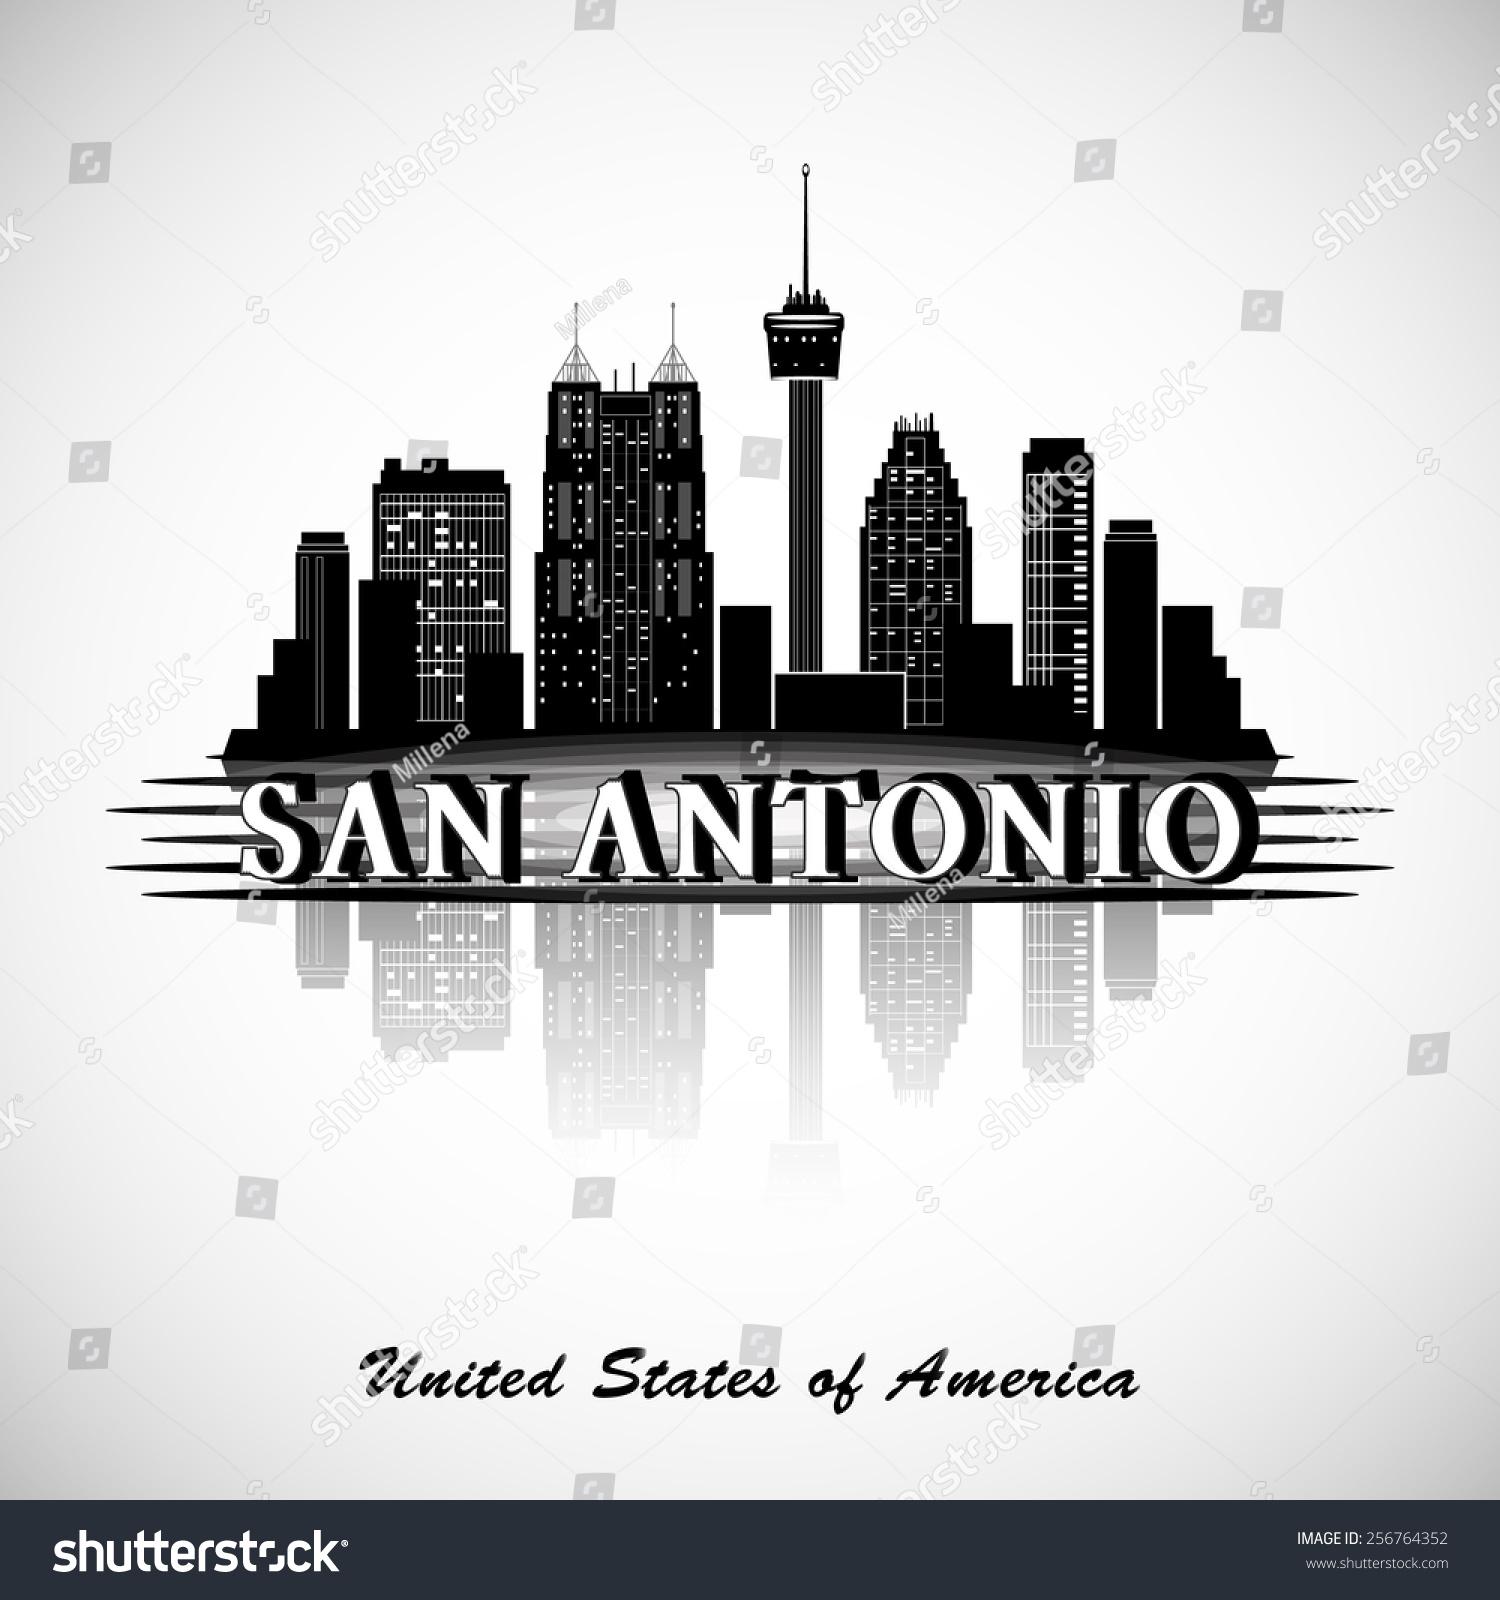 San Antonio Texas City Skyline Silhouette Stock Vector Illustration